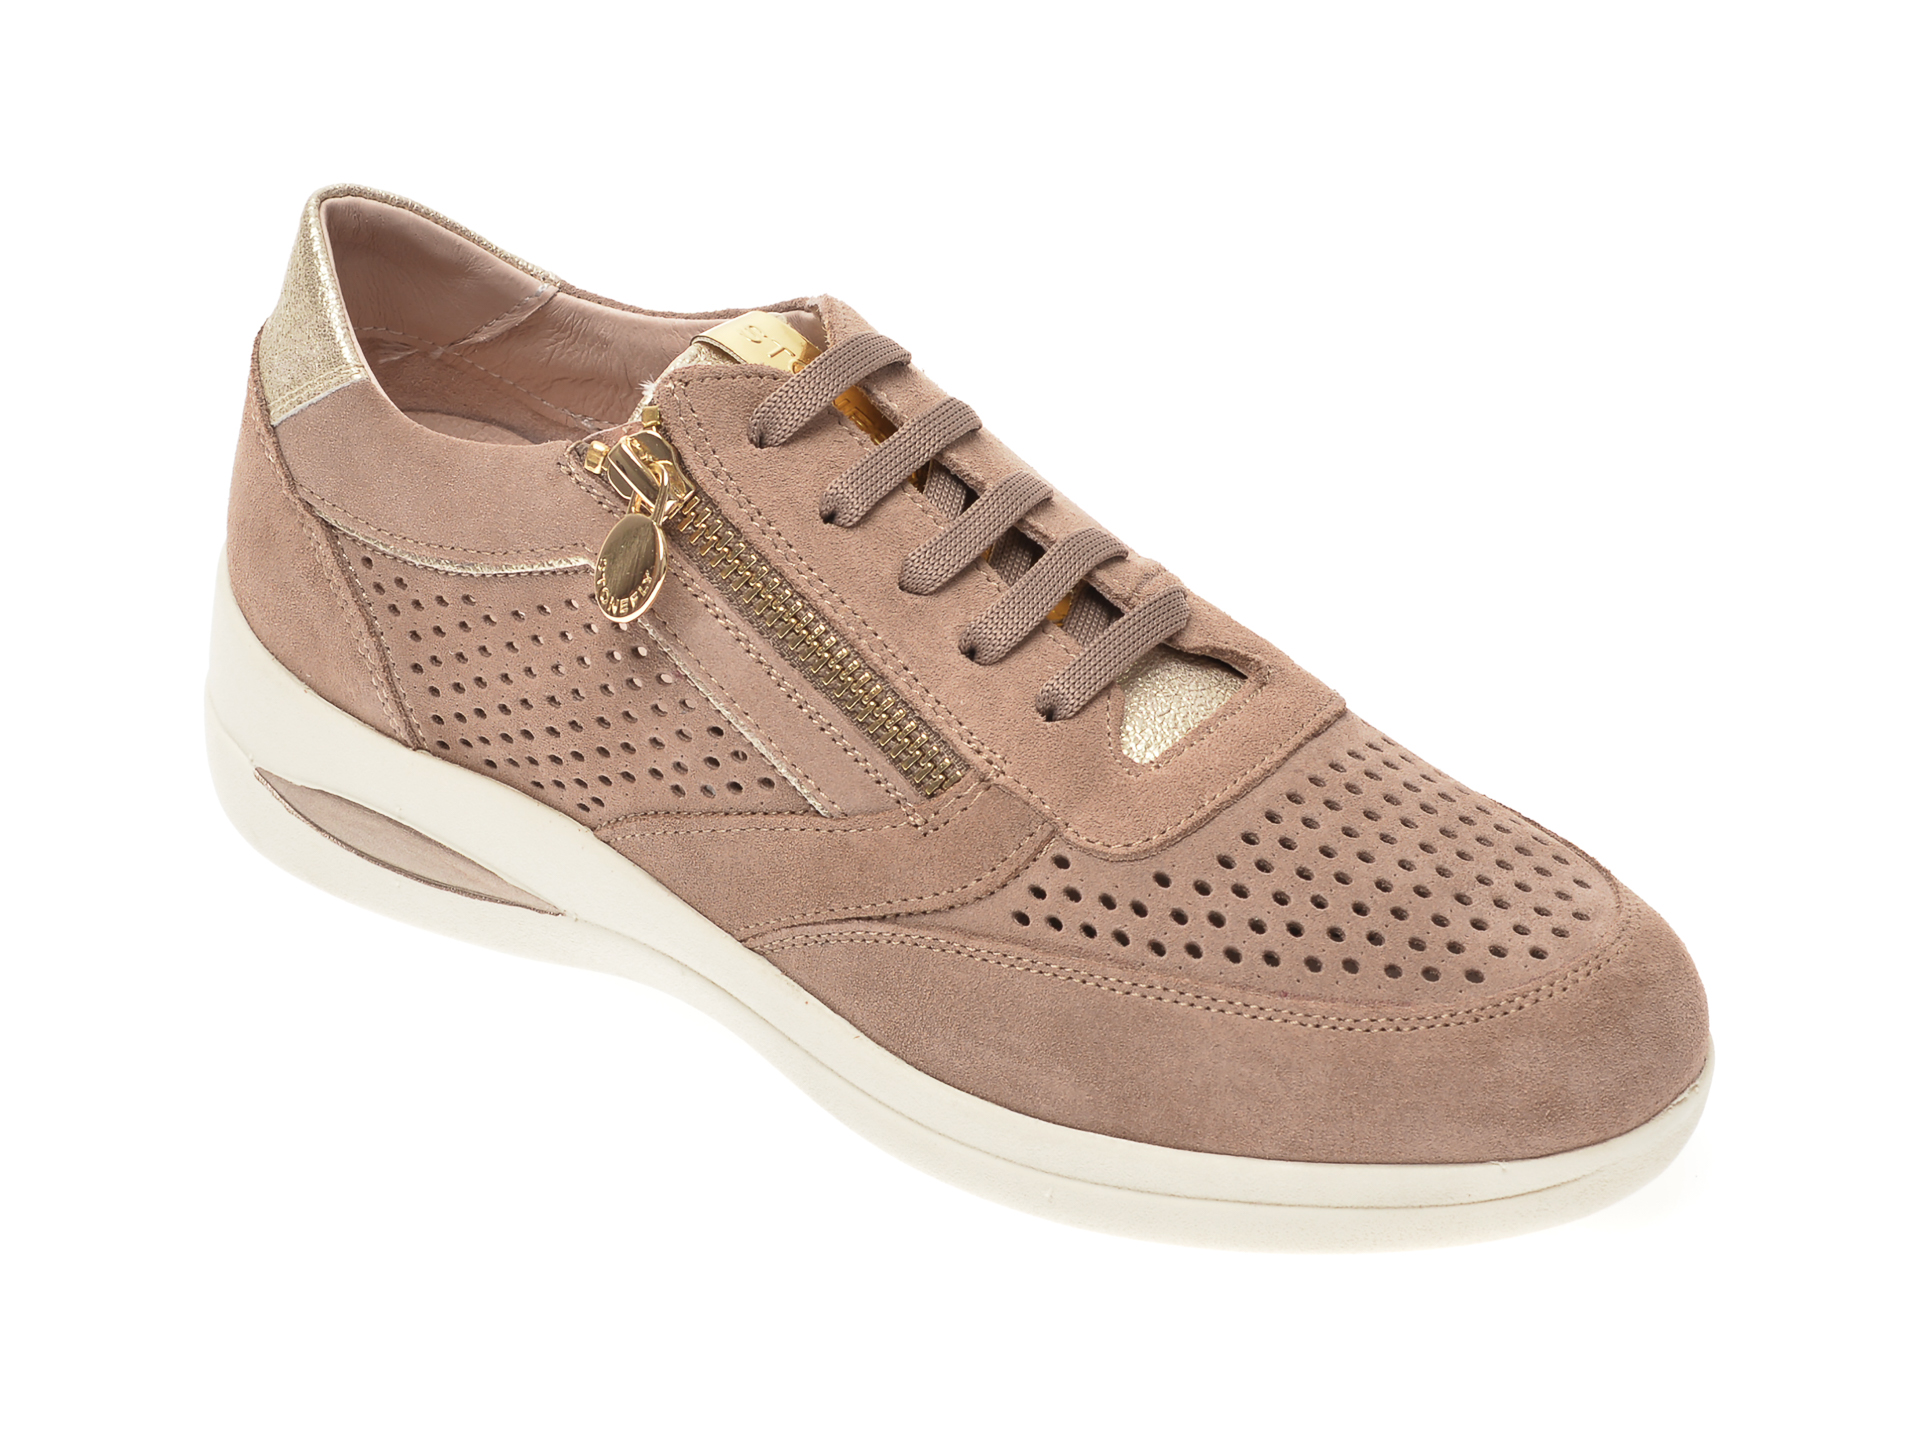 Pantofi STONEFLY maro, AURORA5, din piele intoarsa